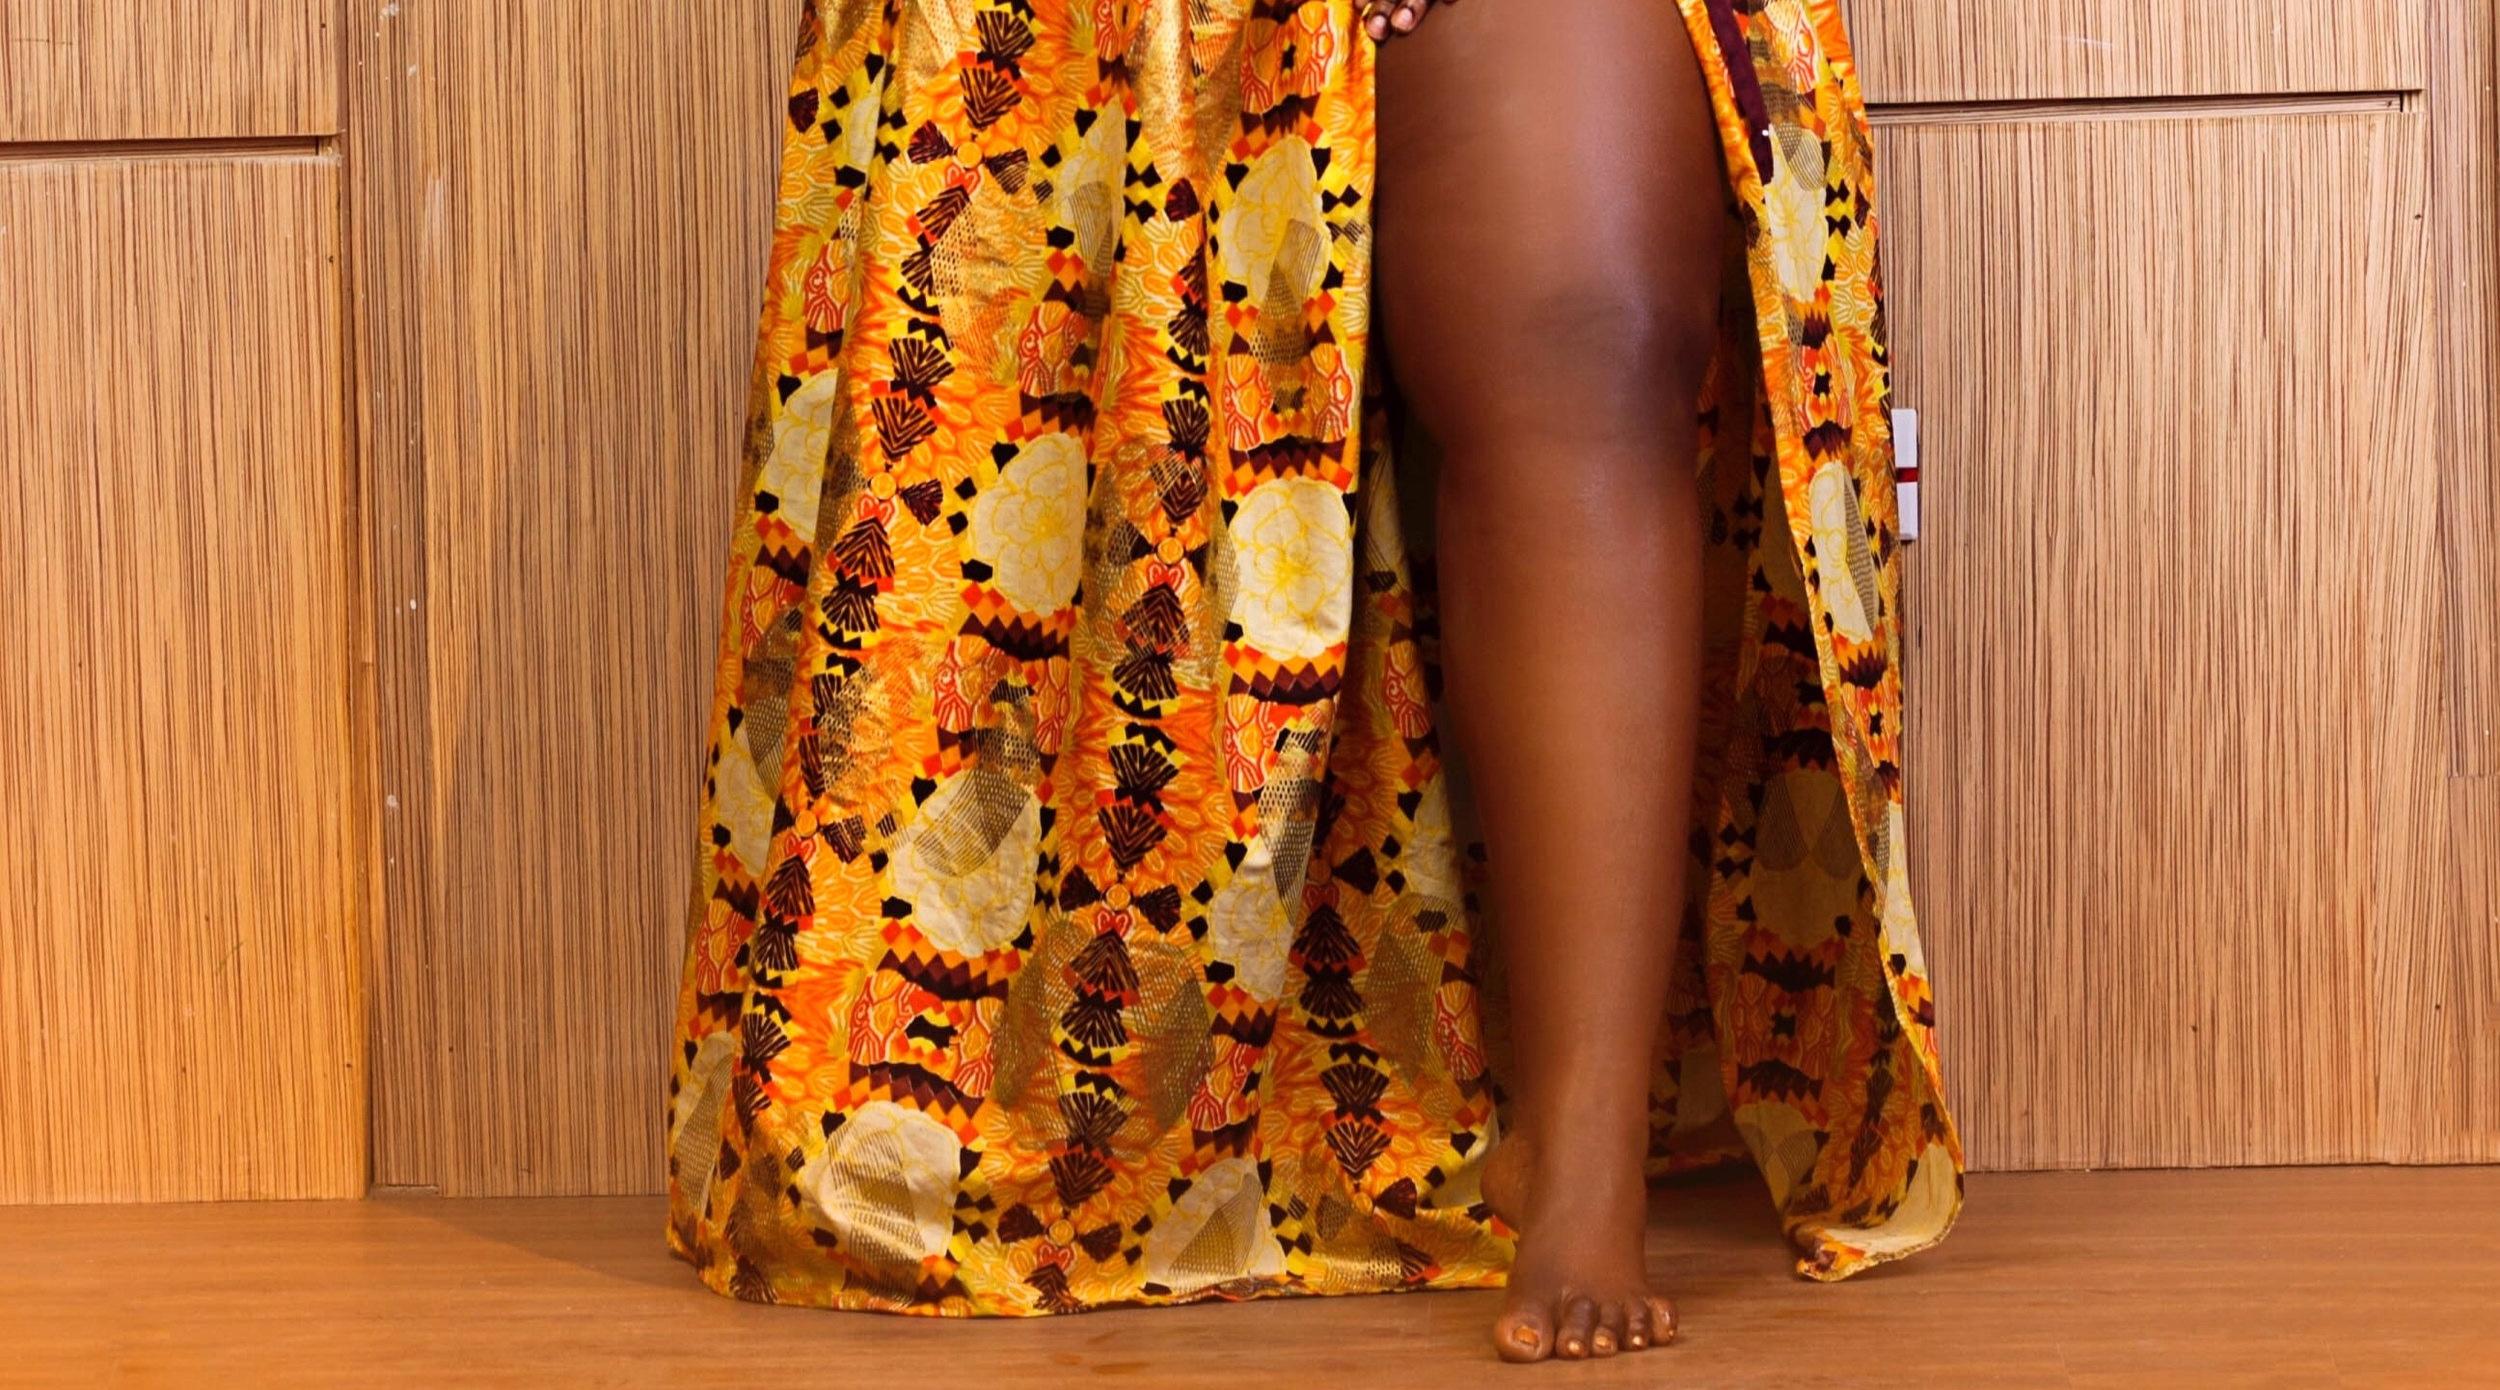 barefoot-elegant-fashion-2395921.jpg